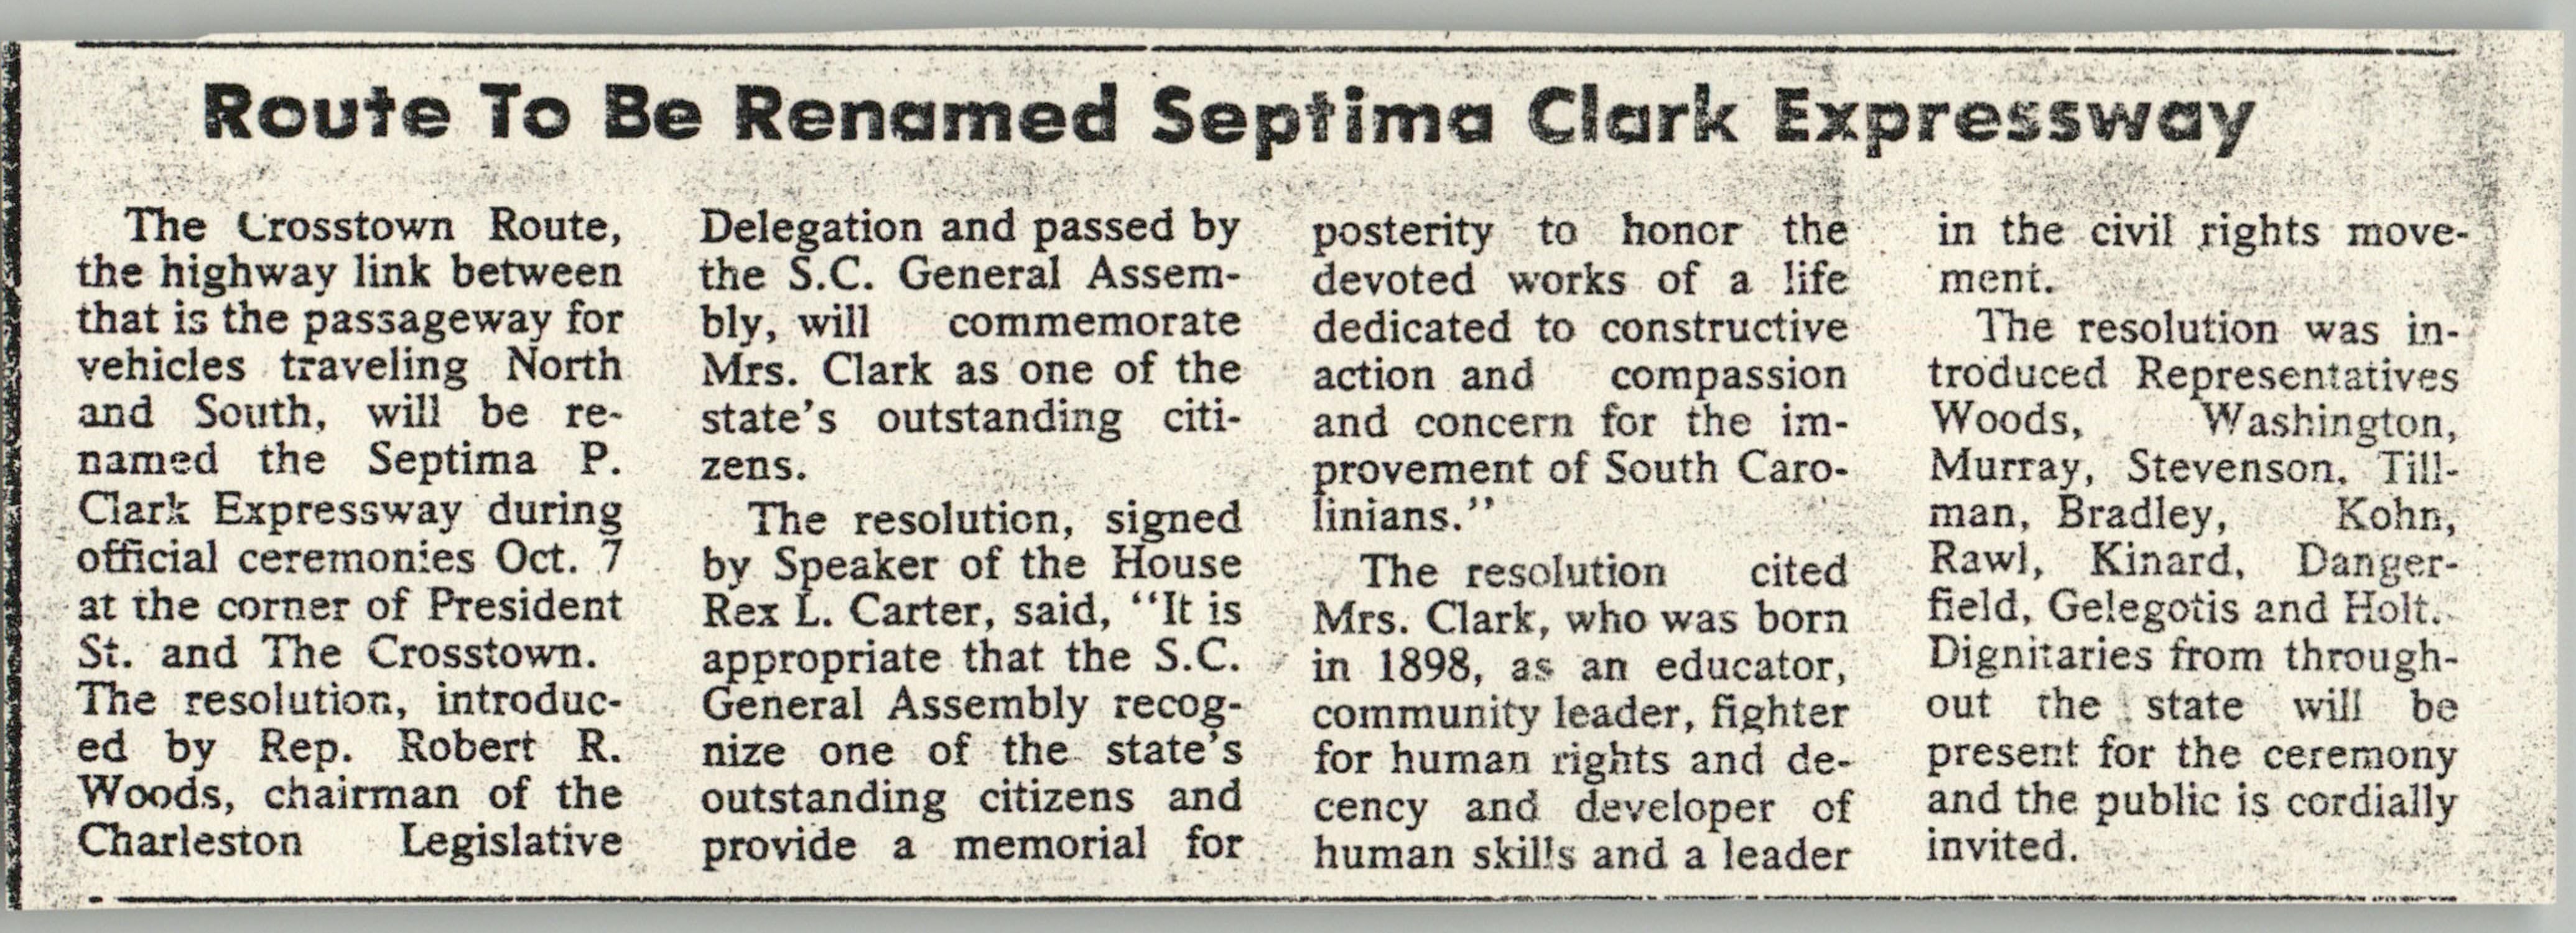 Newspaper Article, Septima Clark Expressway